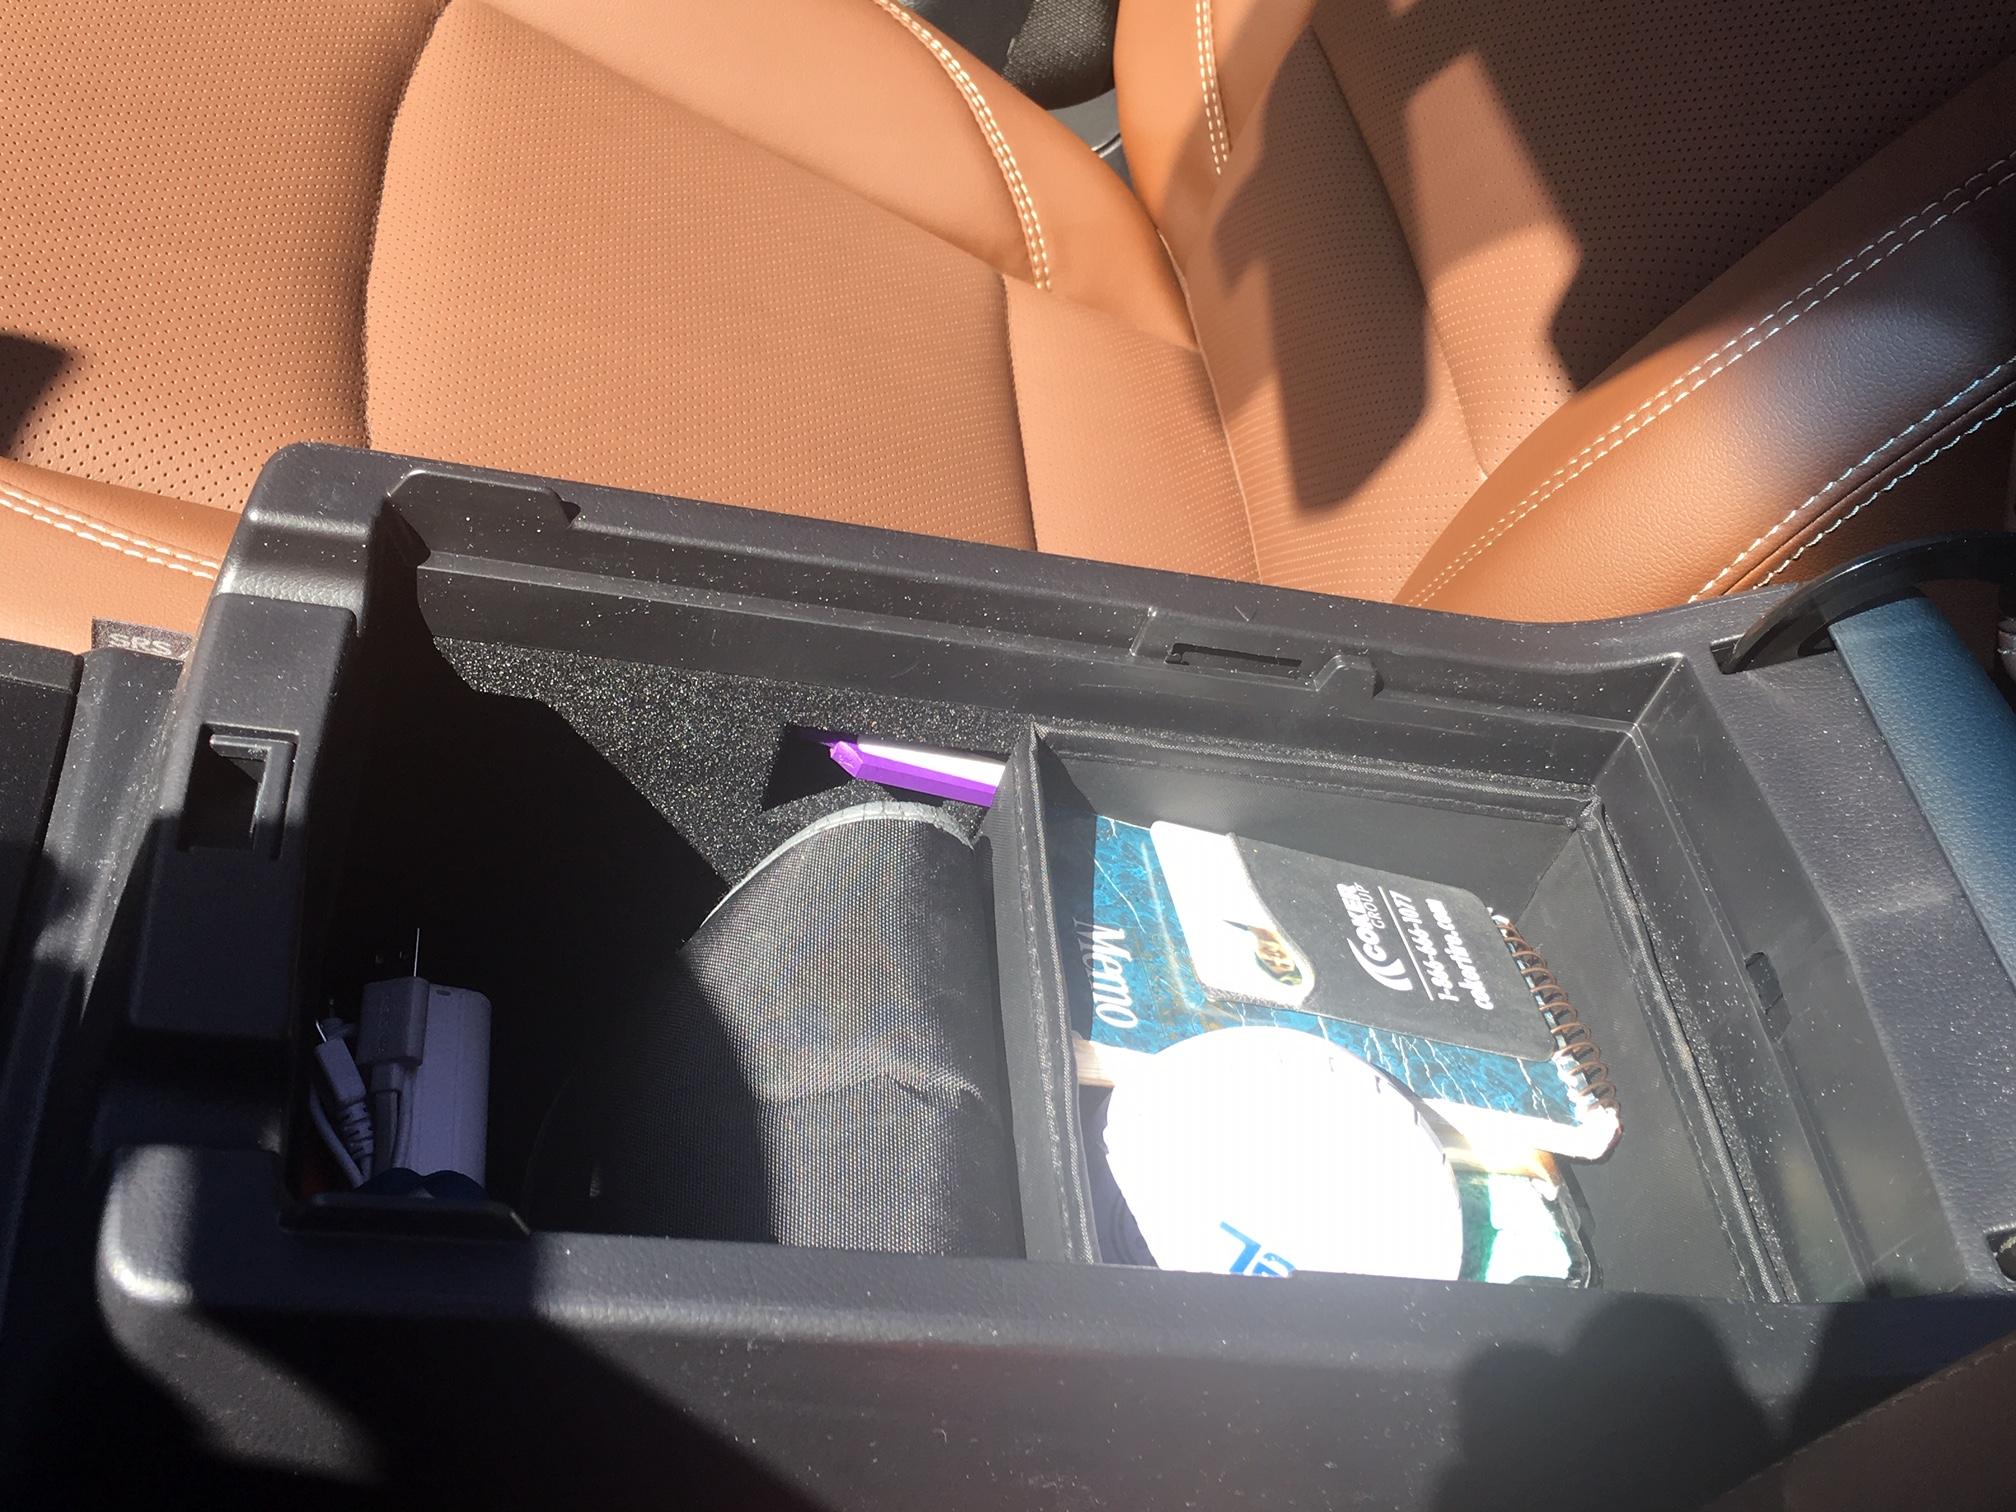 Center Console Organizer From Ikea Subaru Outback